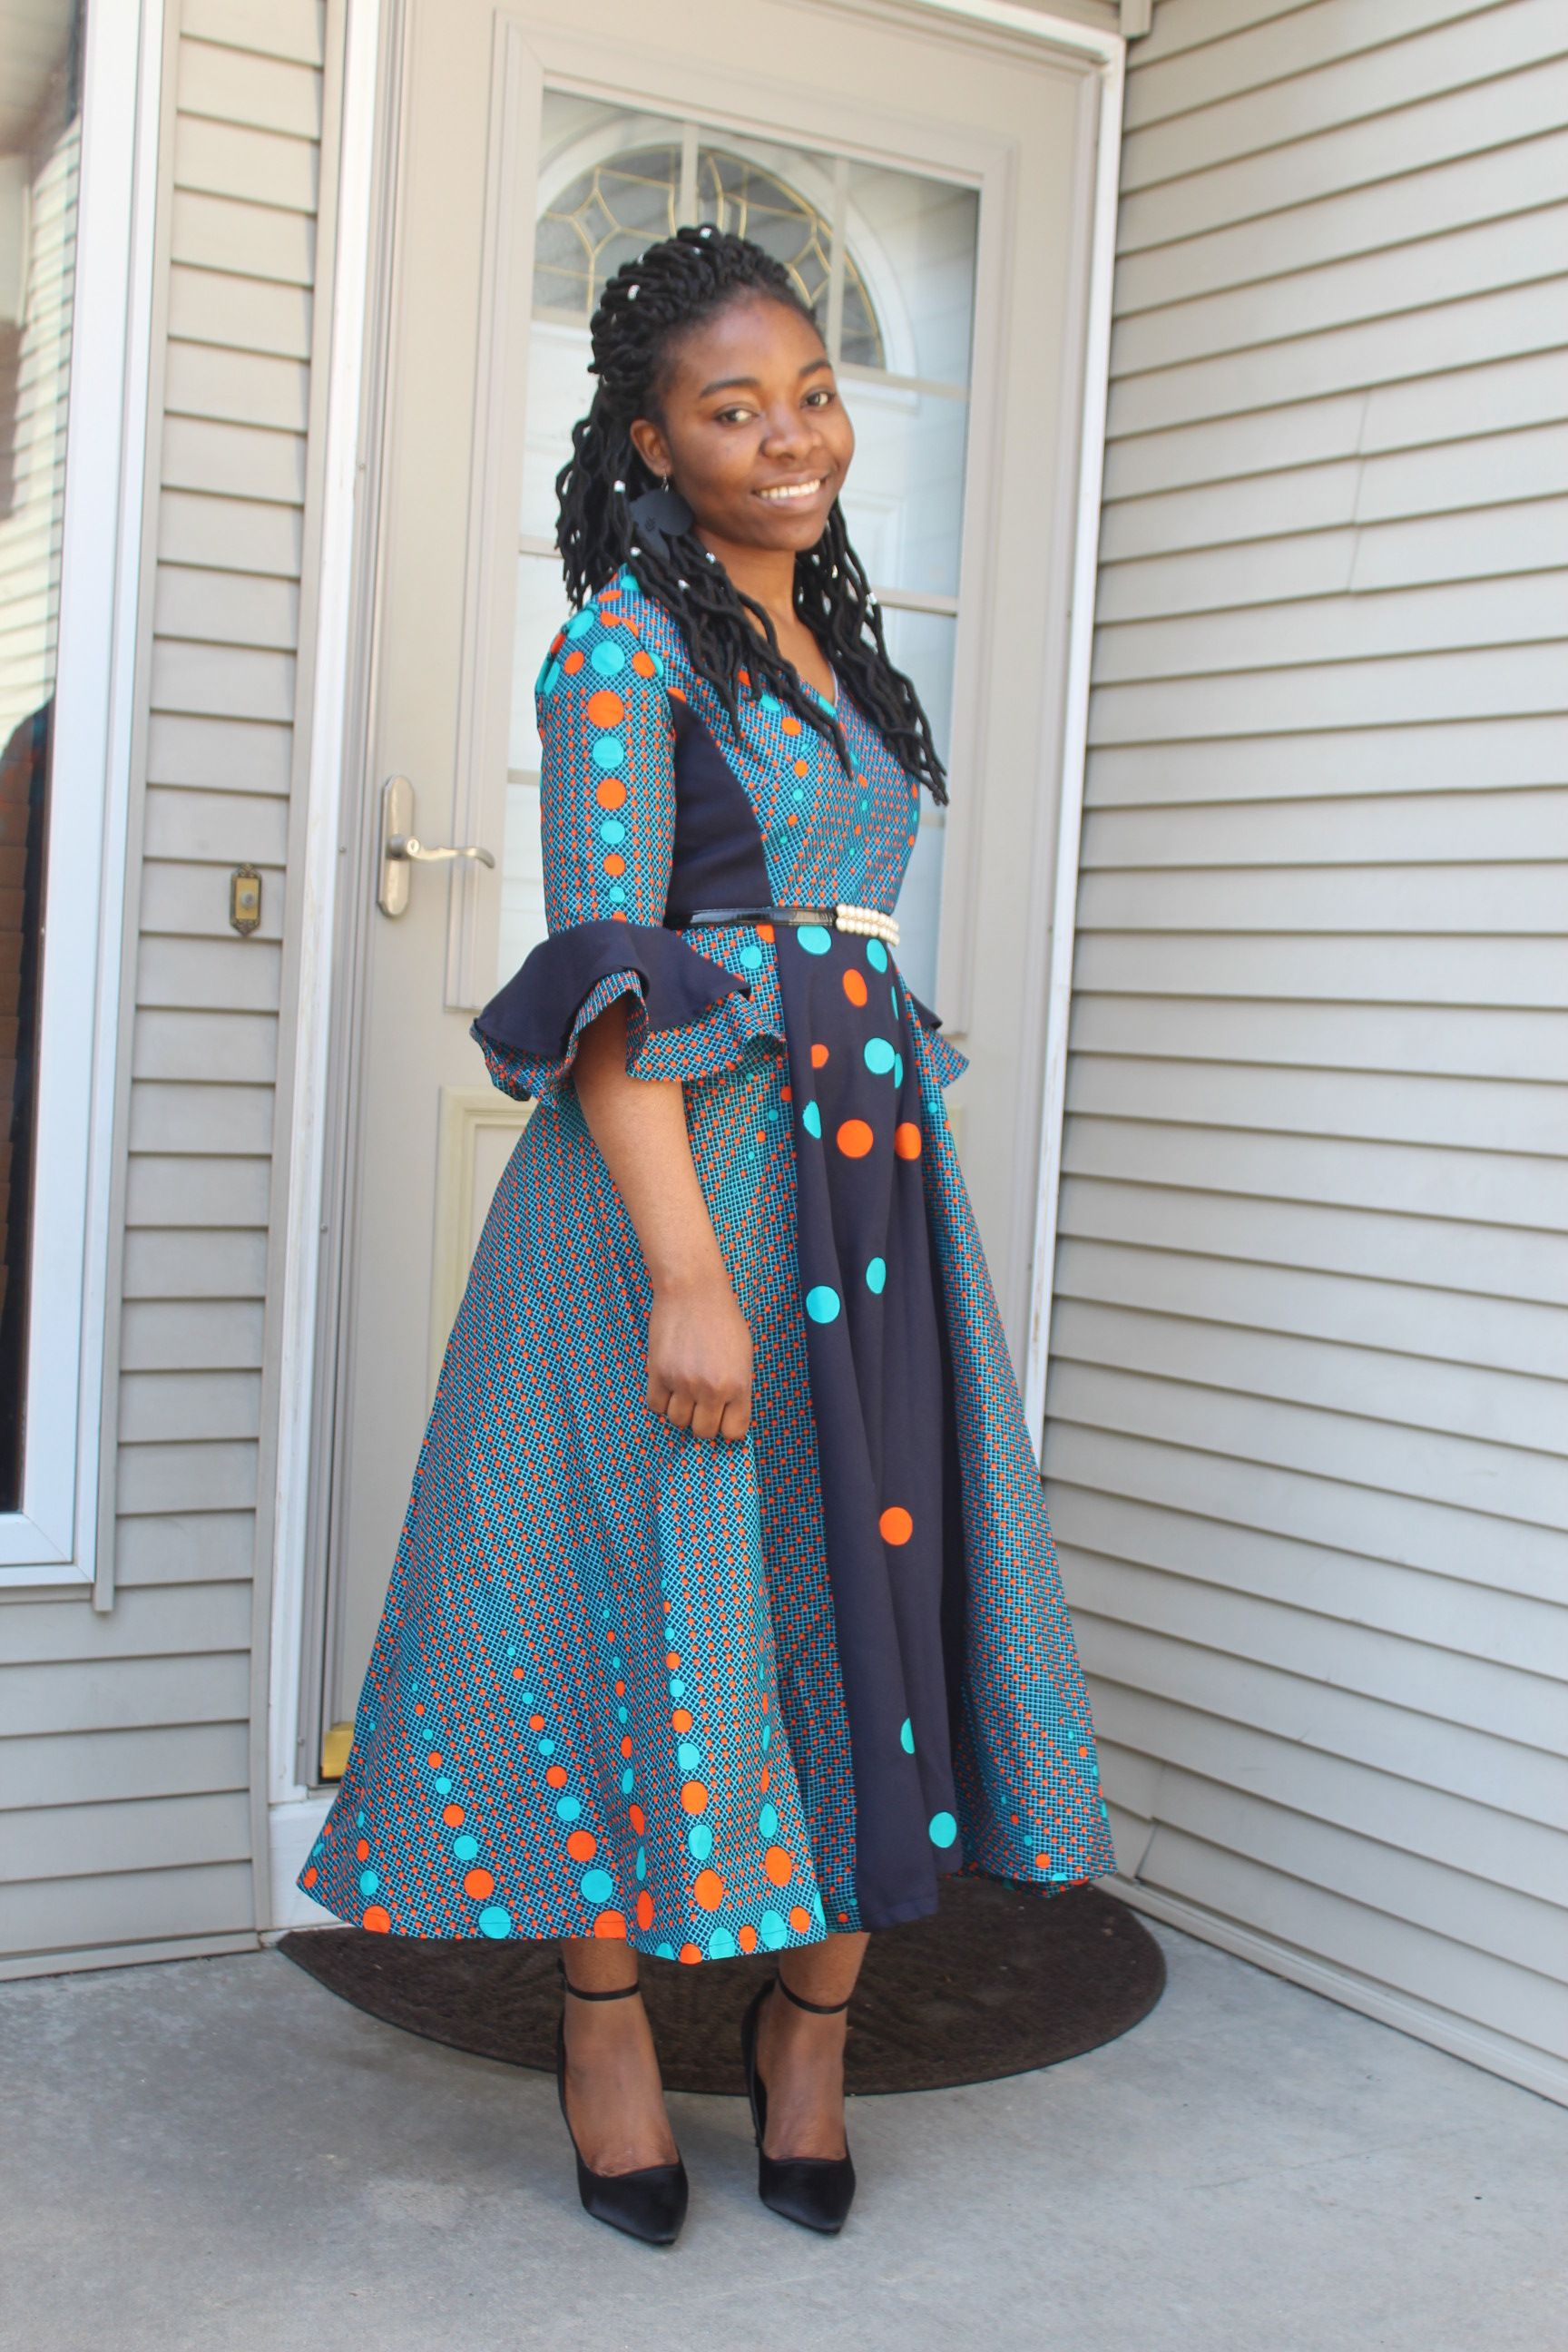 Church outfit idea my diy pinterest church outfits african